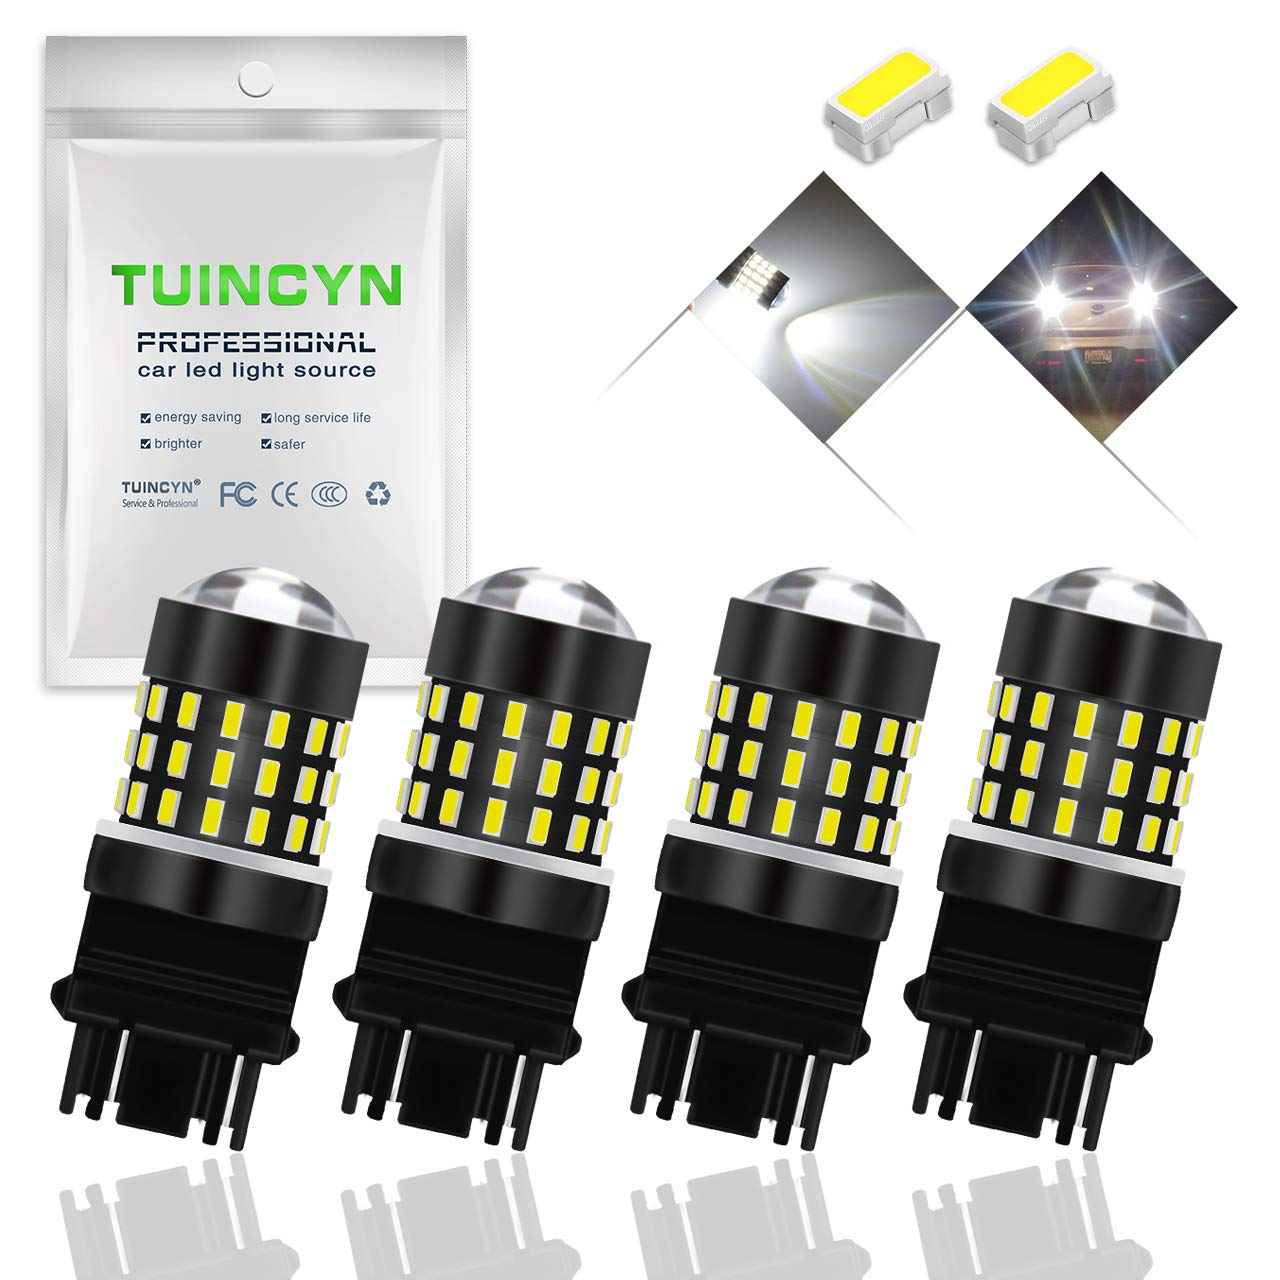 TUINCYN 7443 7440 T20 992 7444NA LED Brake Light Bulbs Red Super Bright 3014 54-EX Chipsets Backup Reverse Light Parking Light Daytime Running Light Rear Turn Signals Light Tail Light 2-Pack